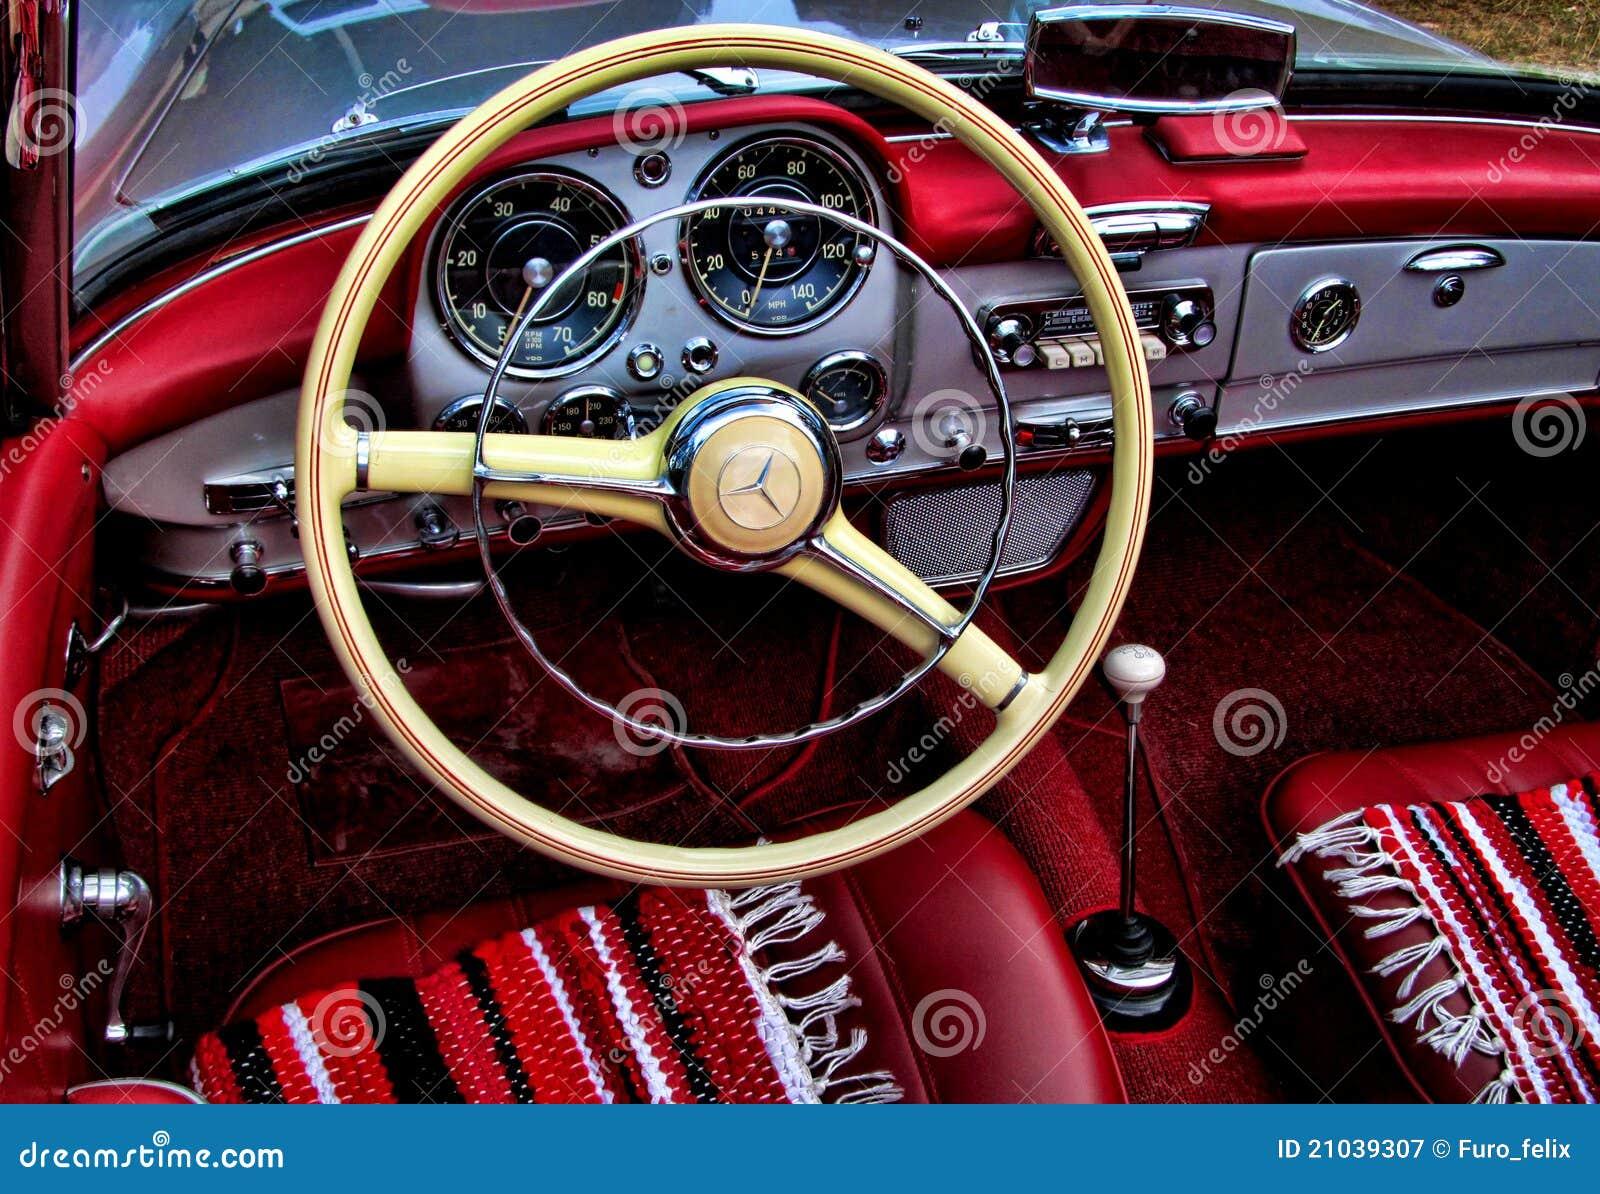 MercedesBenz 190SL Interior Editorial Photography Image